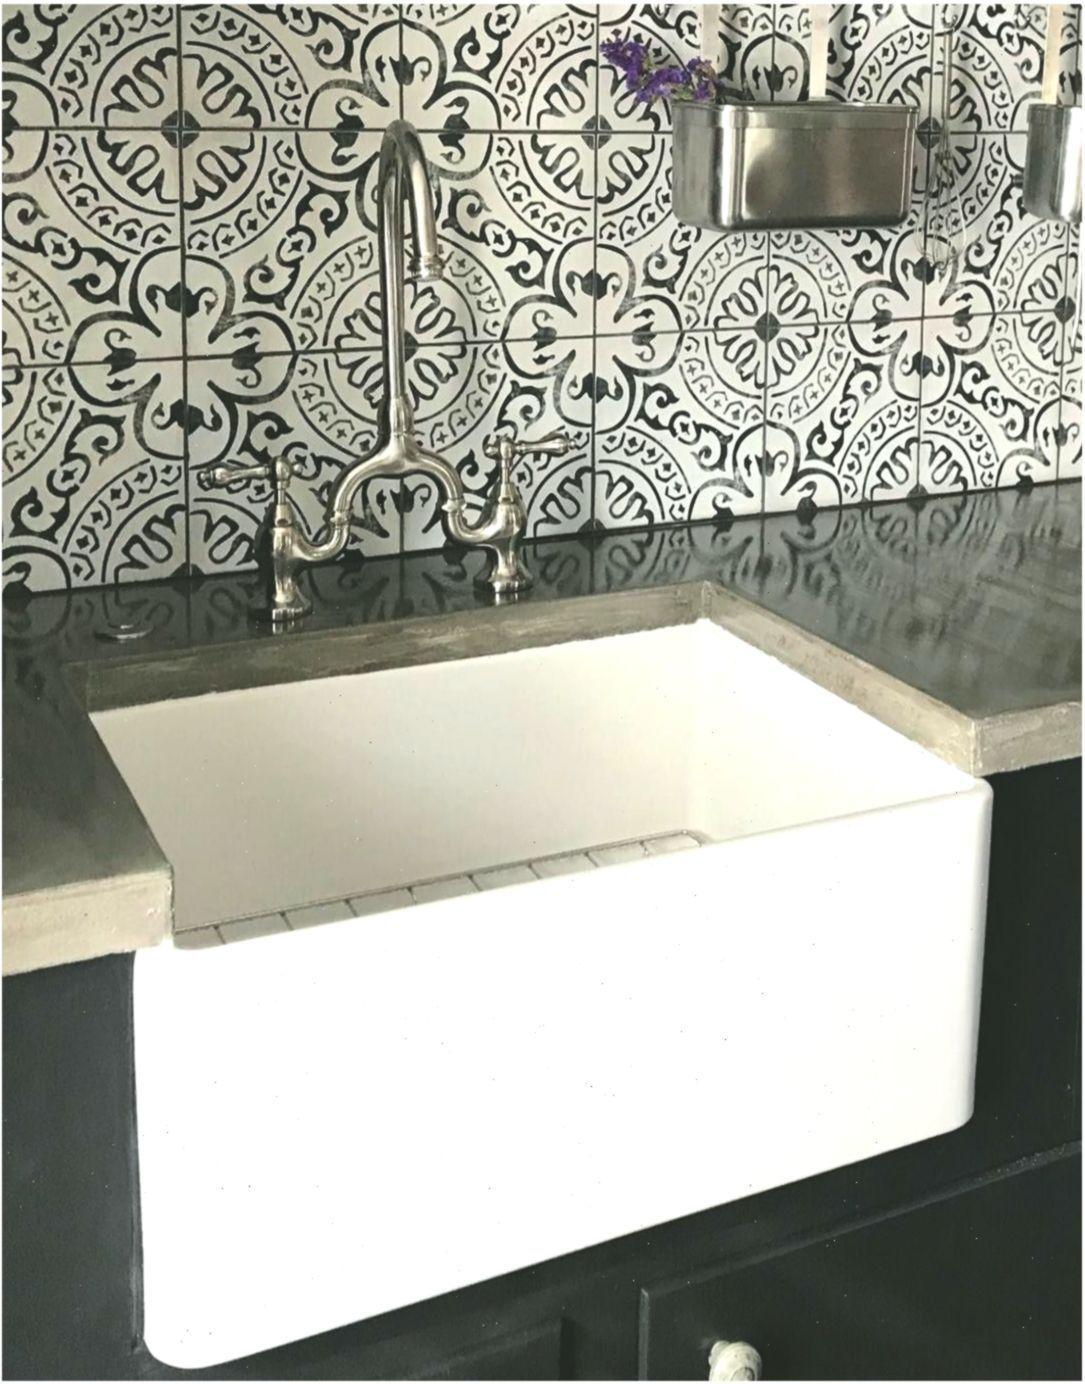 24 Inch Single Bowl Farmhouse Sink With Chrome Drain And Grid Weiesbauernhauswa Bowl Farmhouse Sink Sink Shower Style